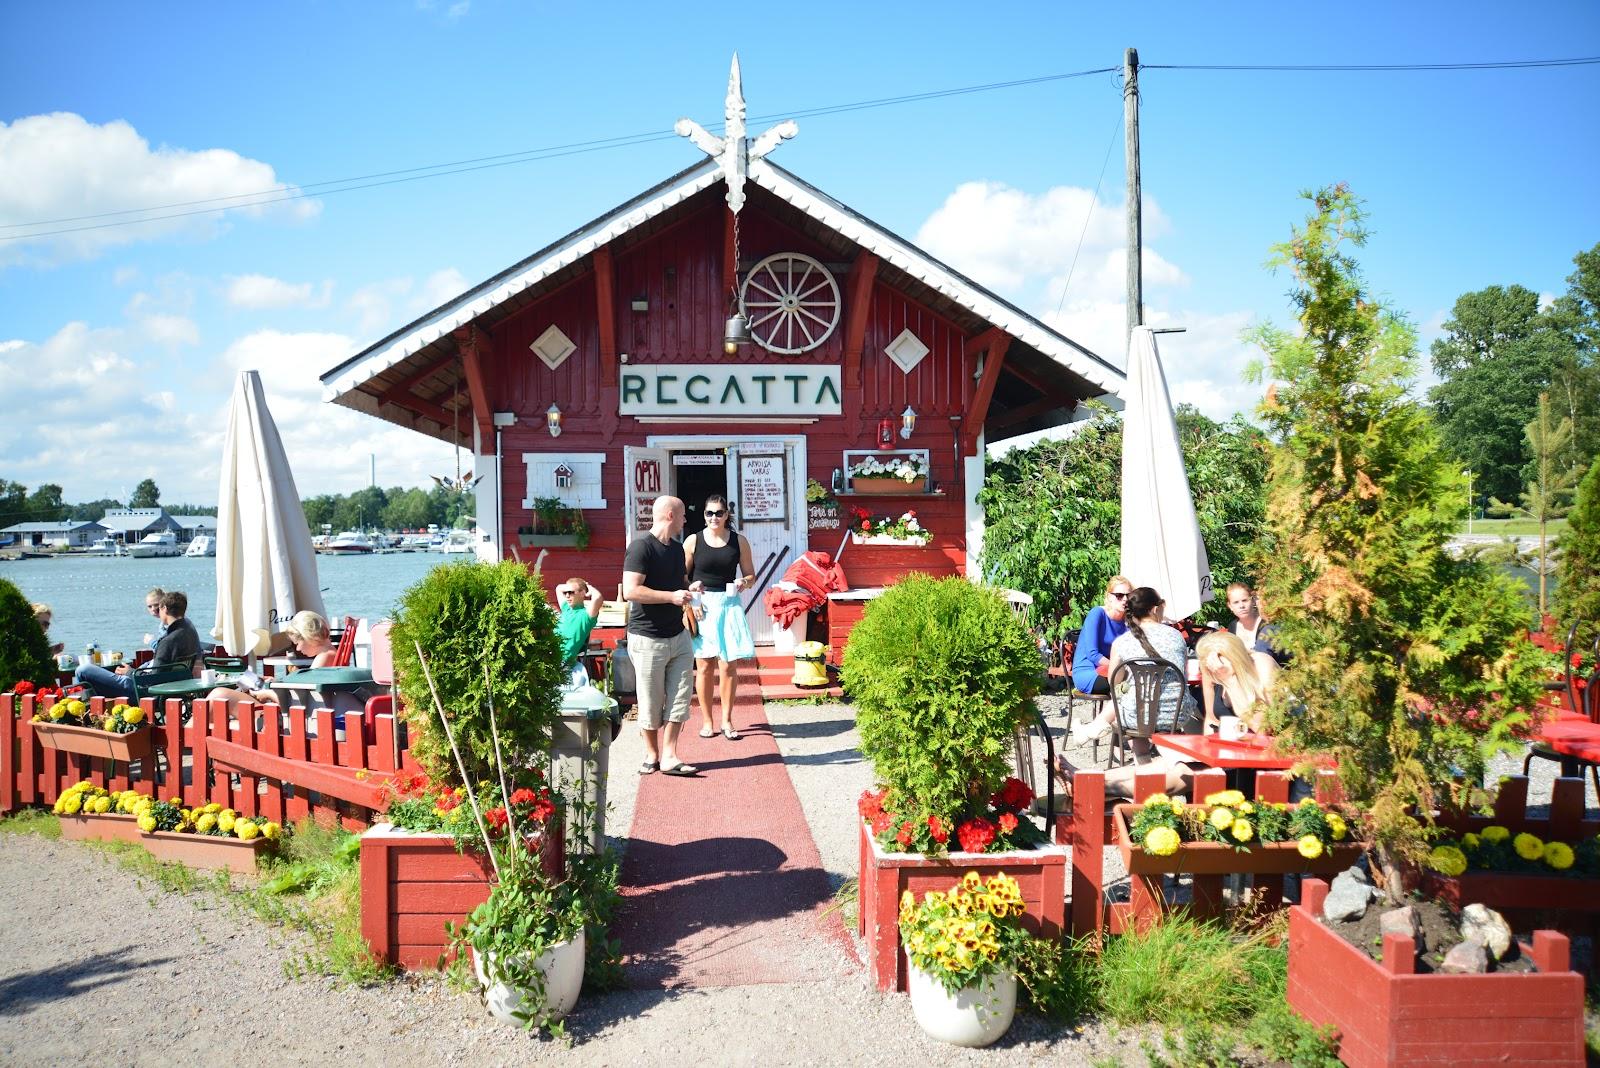 Takk Travels: Cafe Regatta